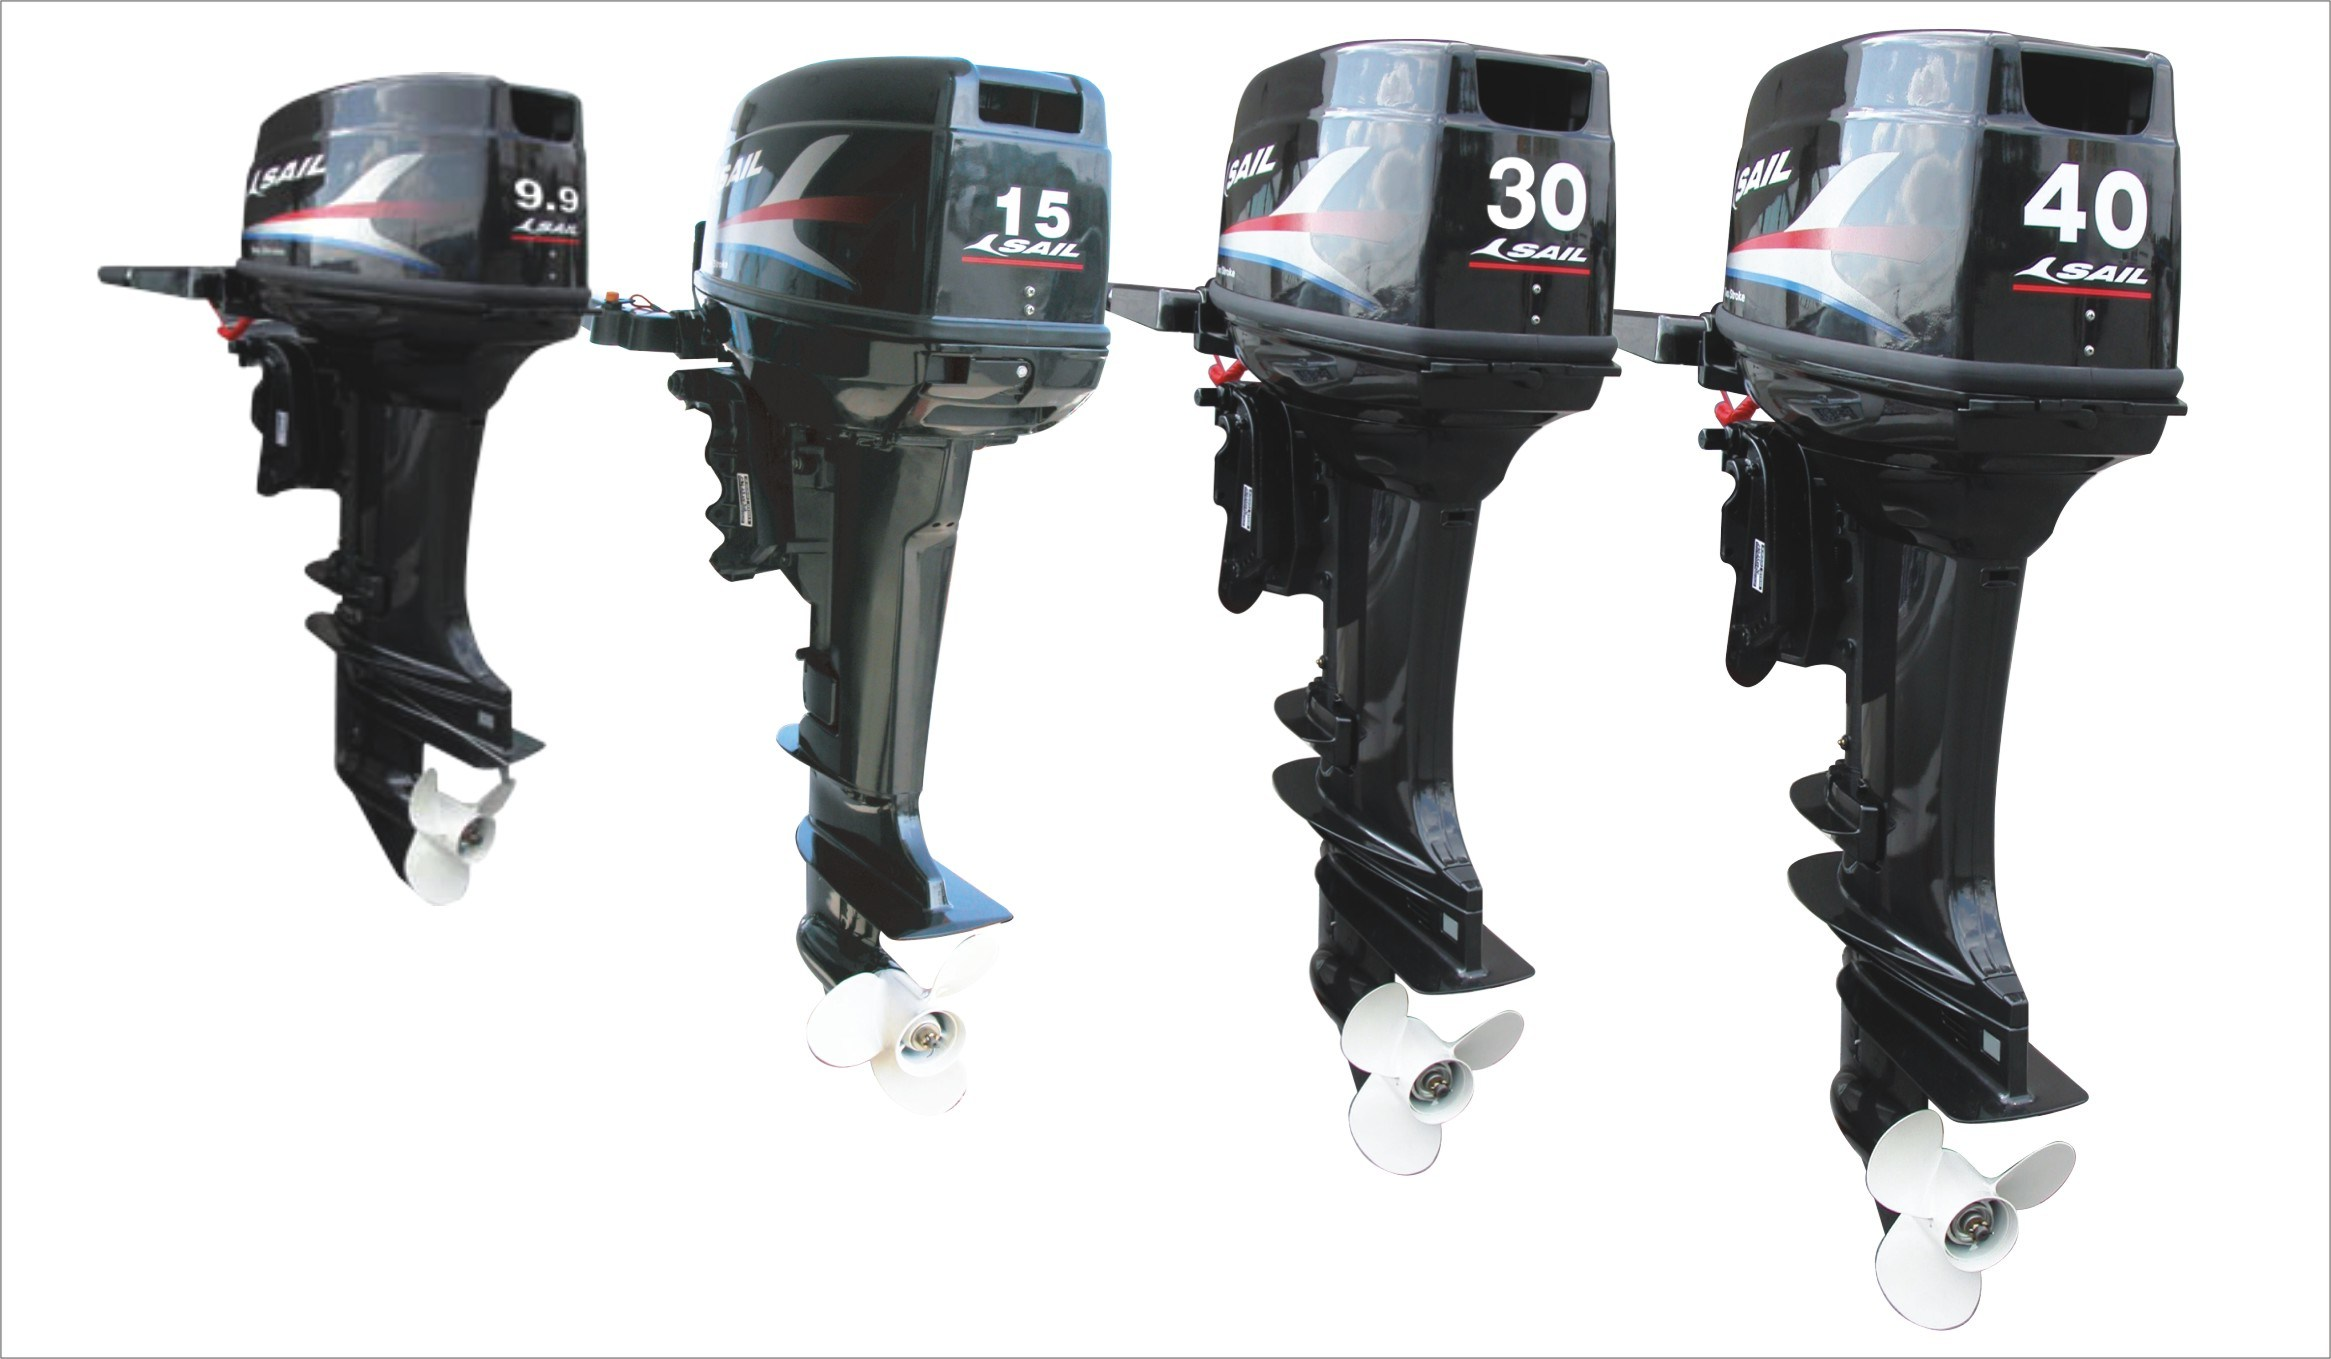 2-Stroke 9.9HP, 15HP, 30HP, 40HP Outboad Motor